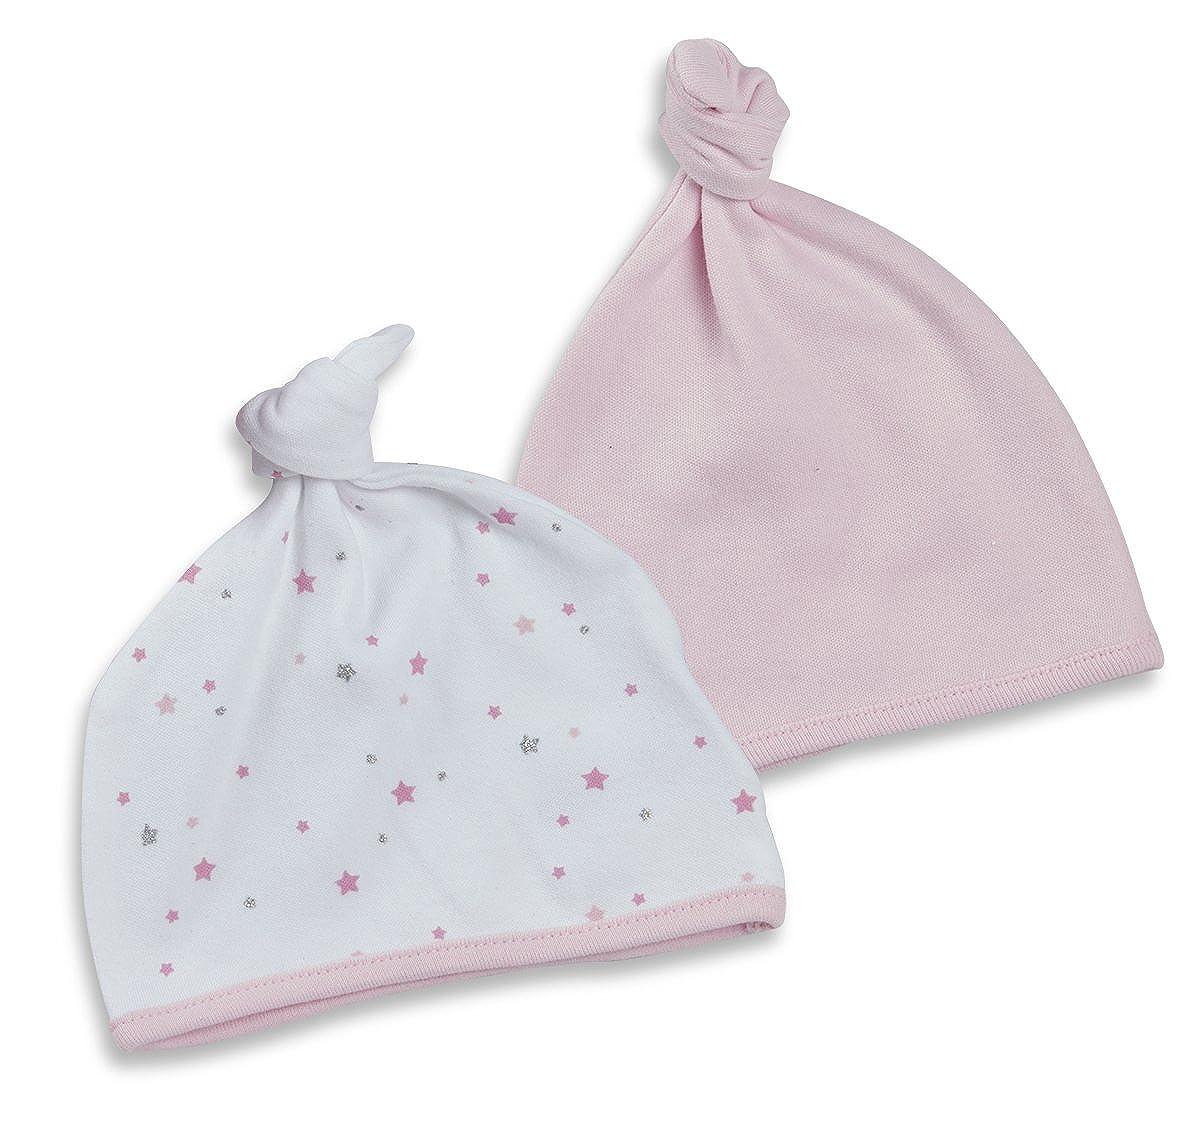 BABY TOWN Babytown Multi Pack Baby Girls Boys Top Knot Hats Printed Stars Newborn Unisex New